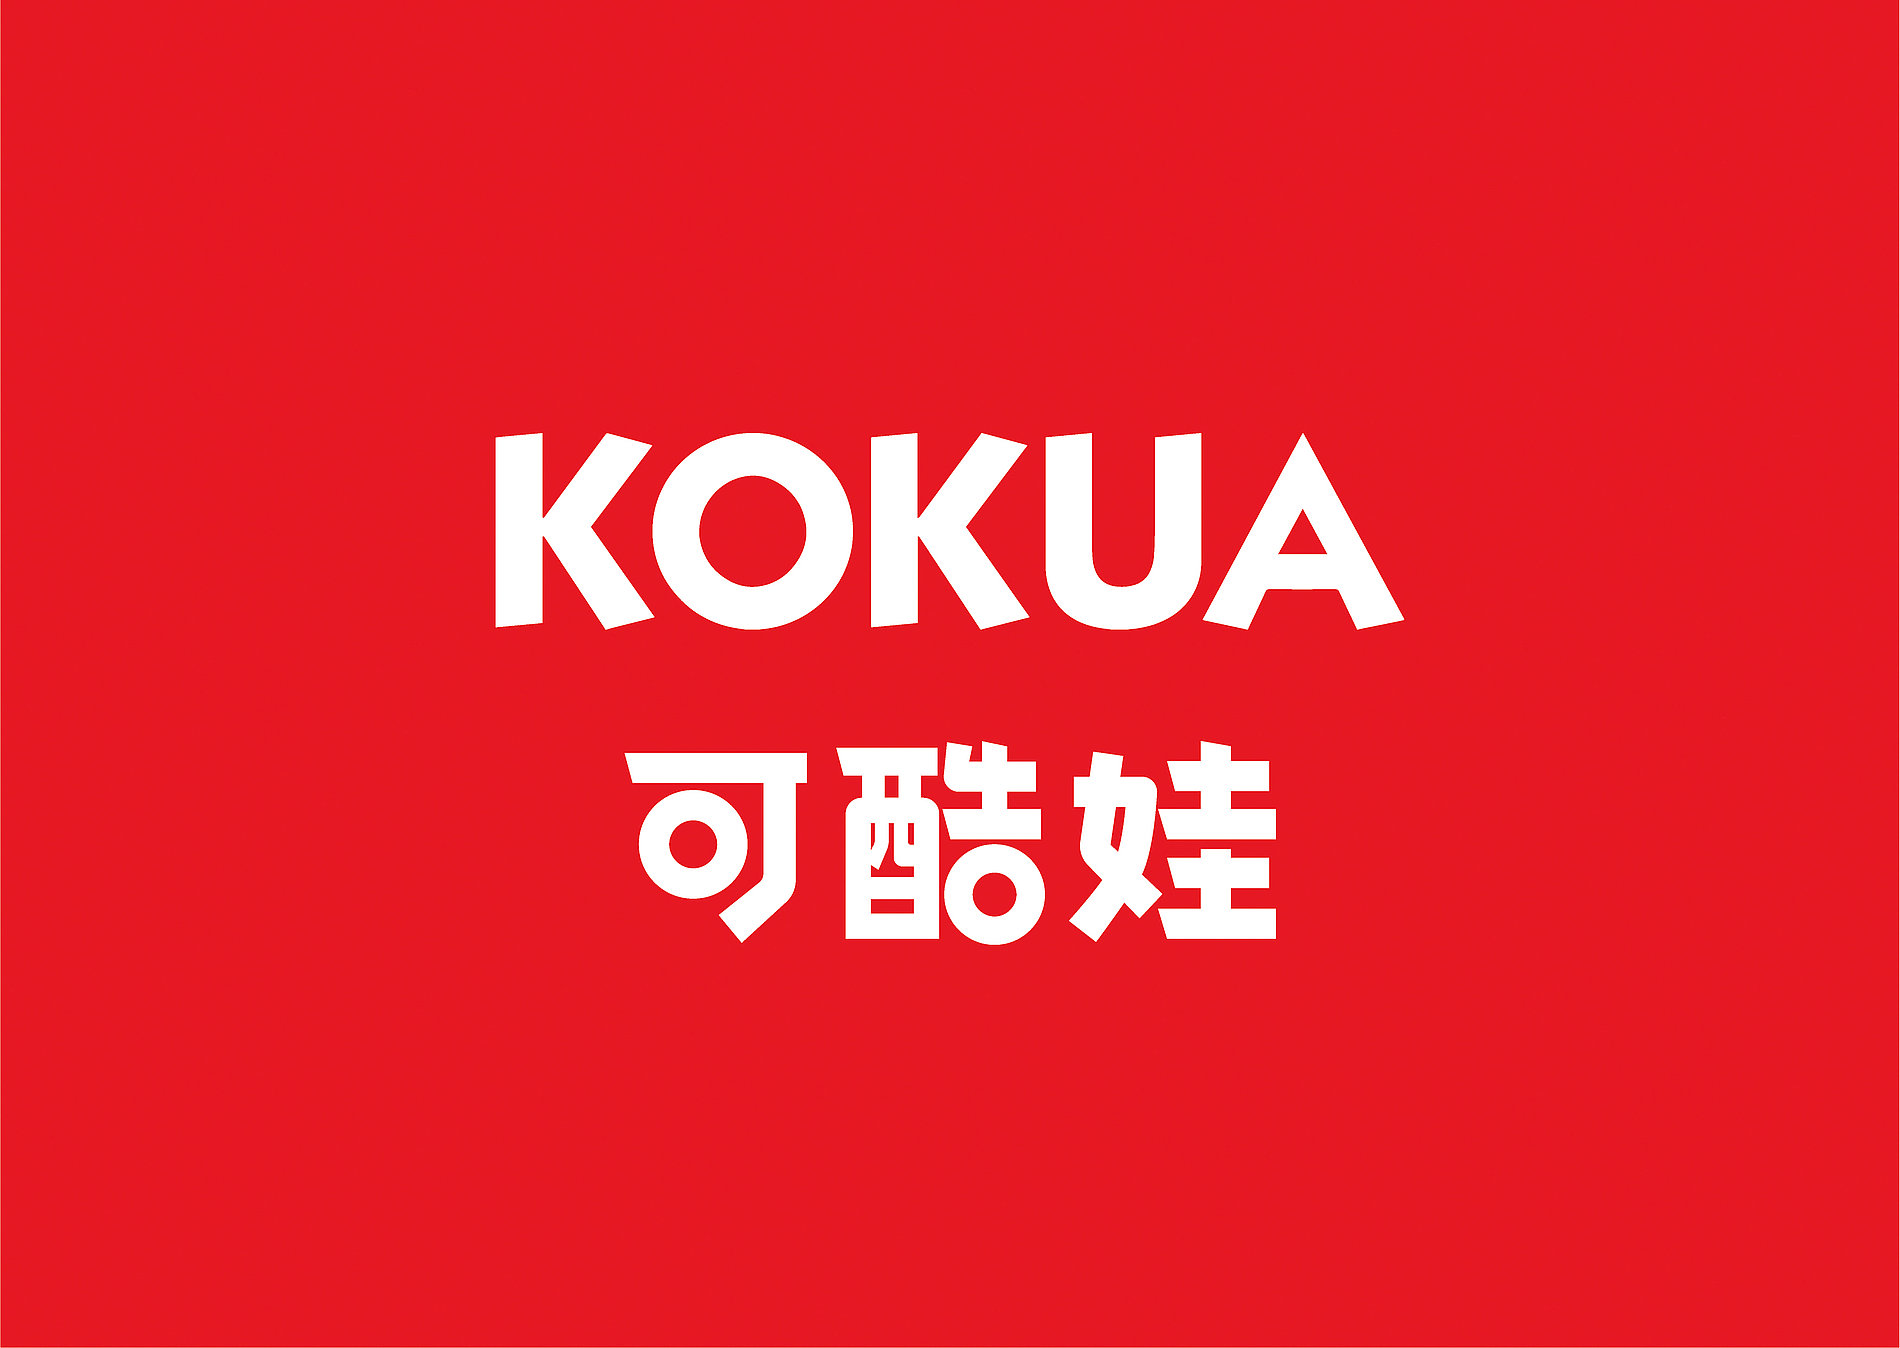 Kokua | Red Dot Design Award